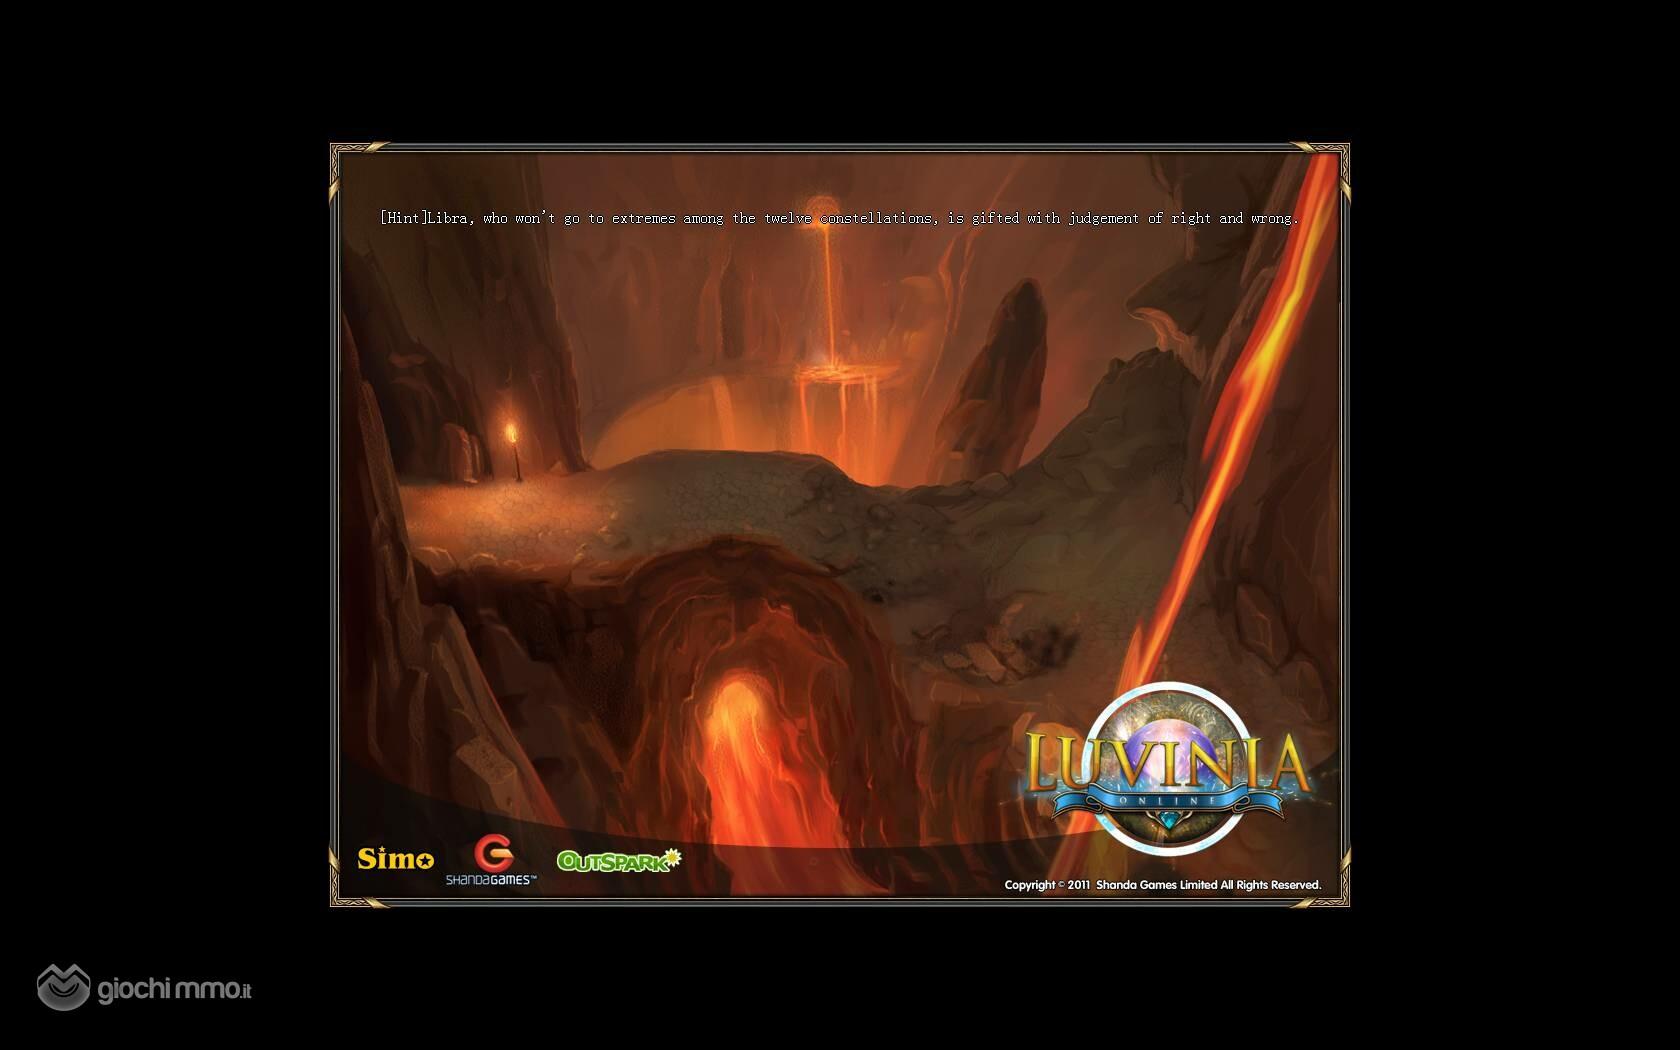 Clicca sull'immagine per ingrandirlaNome:   Luvinia Online screen13.jpgVisite: 50Dimensione:   139.0 KBID: 8866